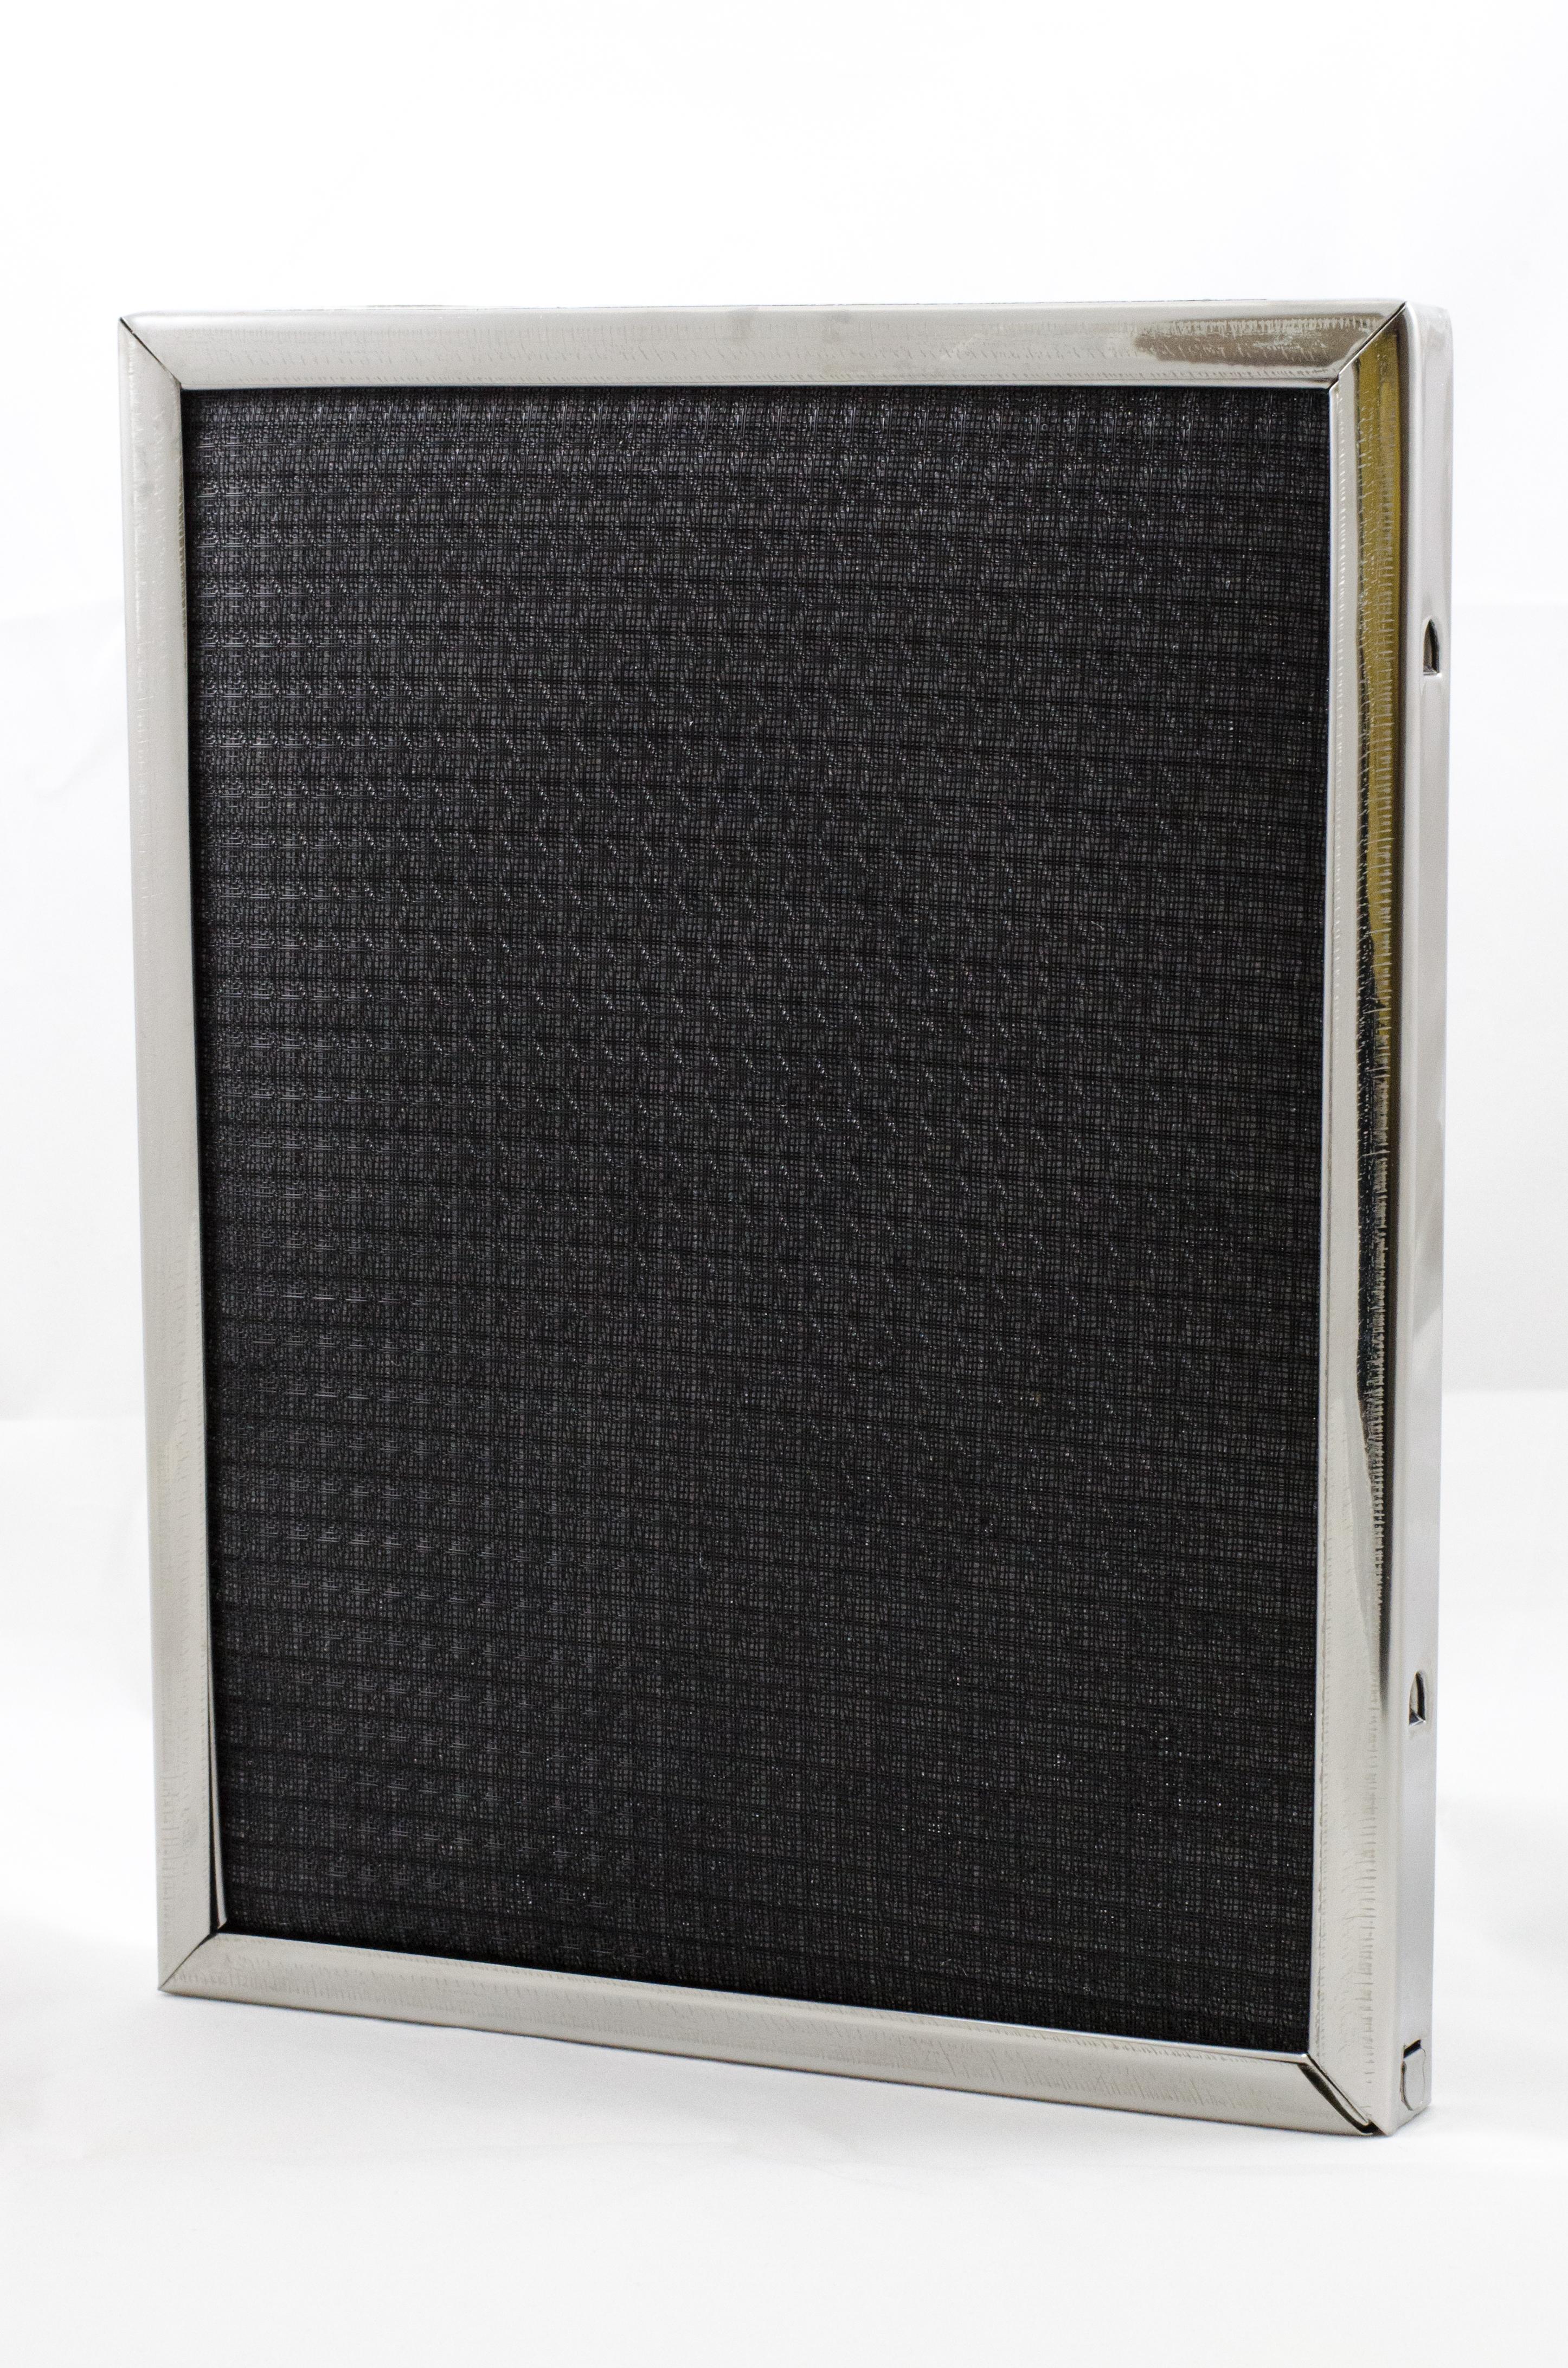 DustEater Electrostatic Air Filter